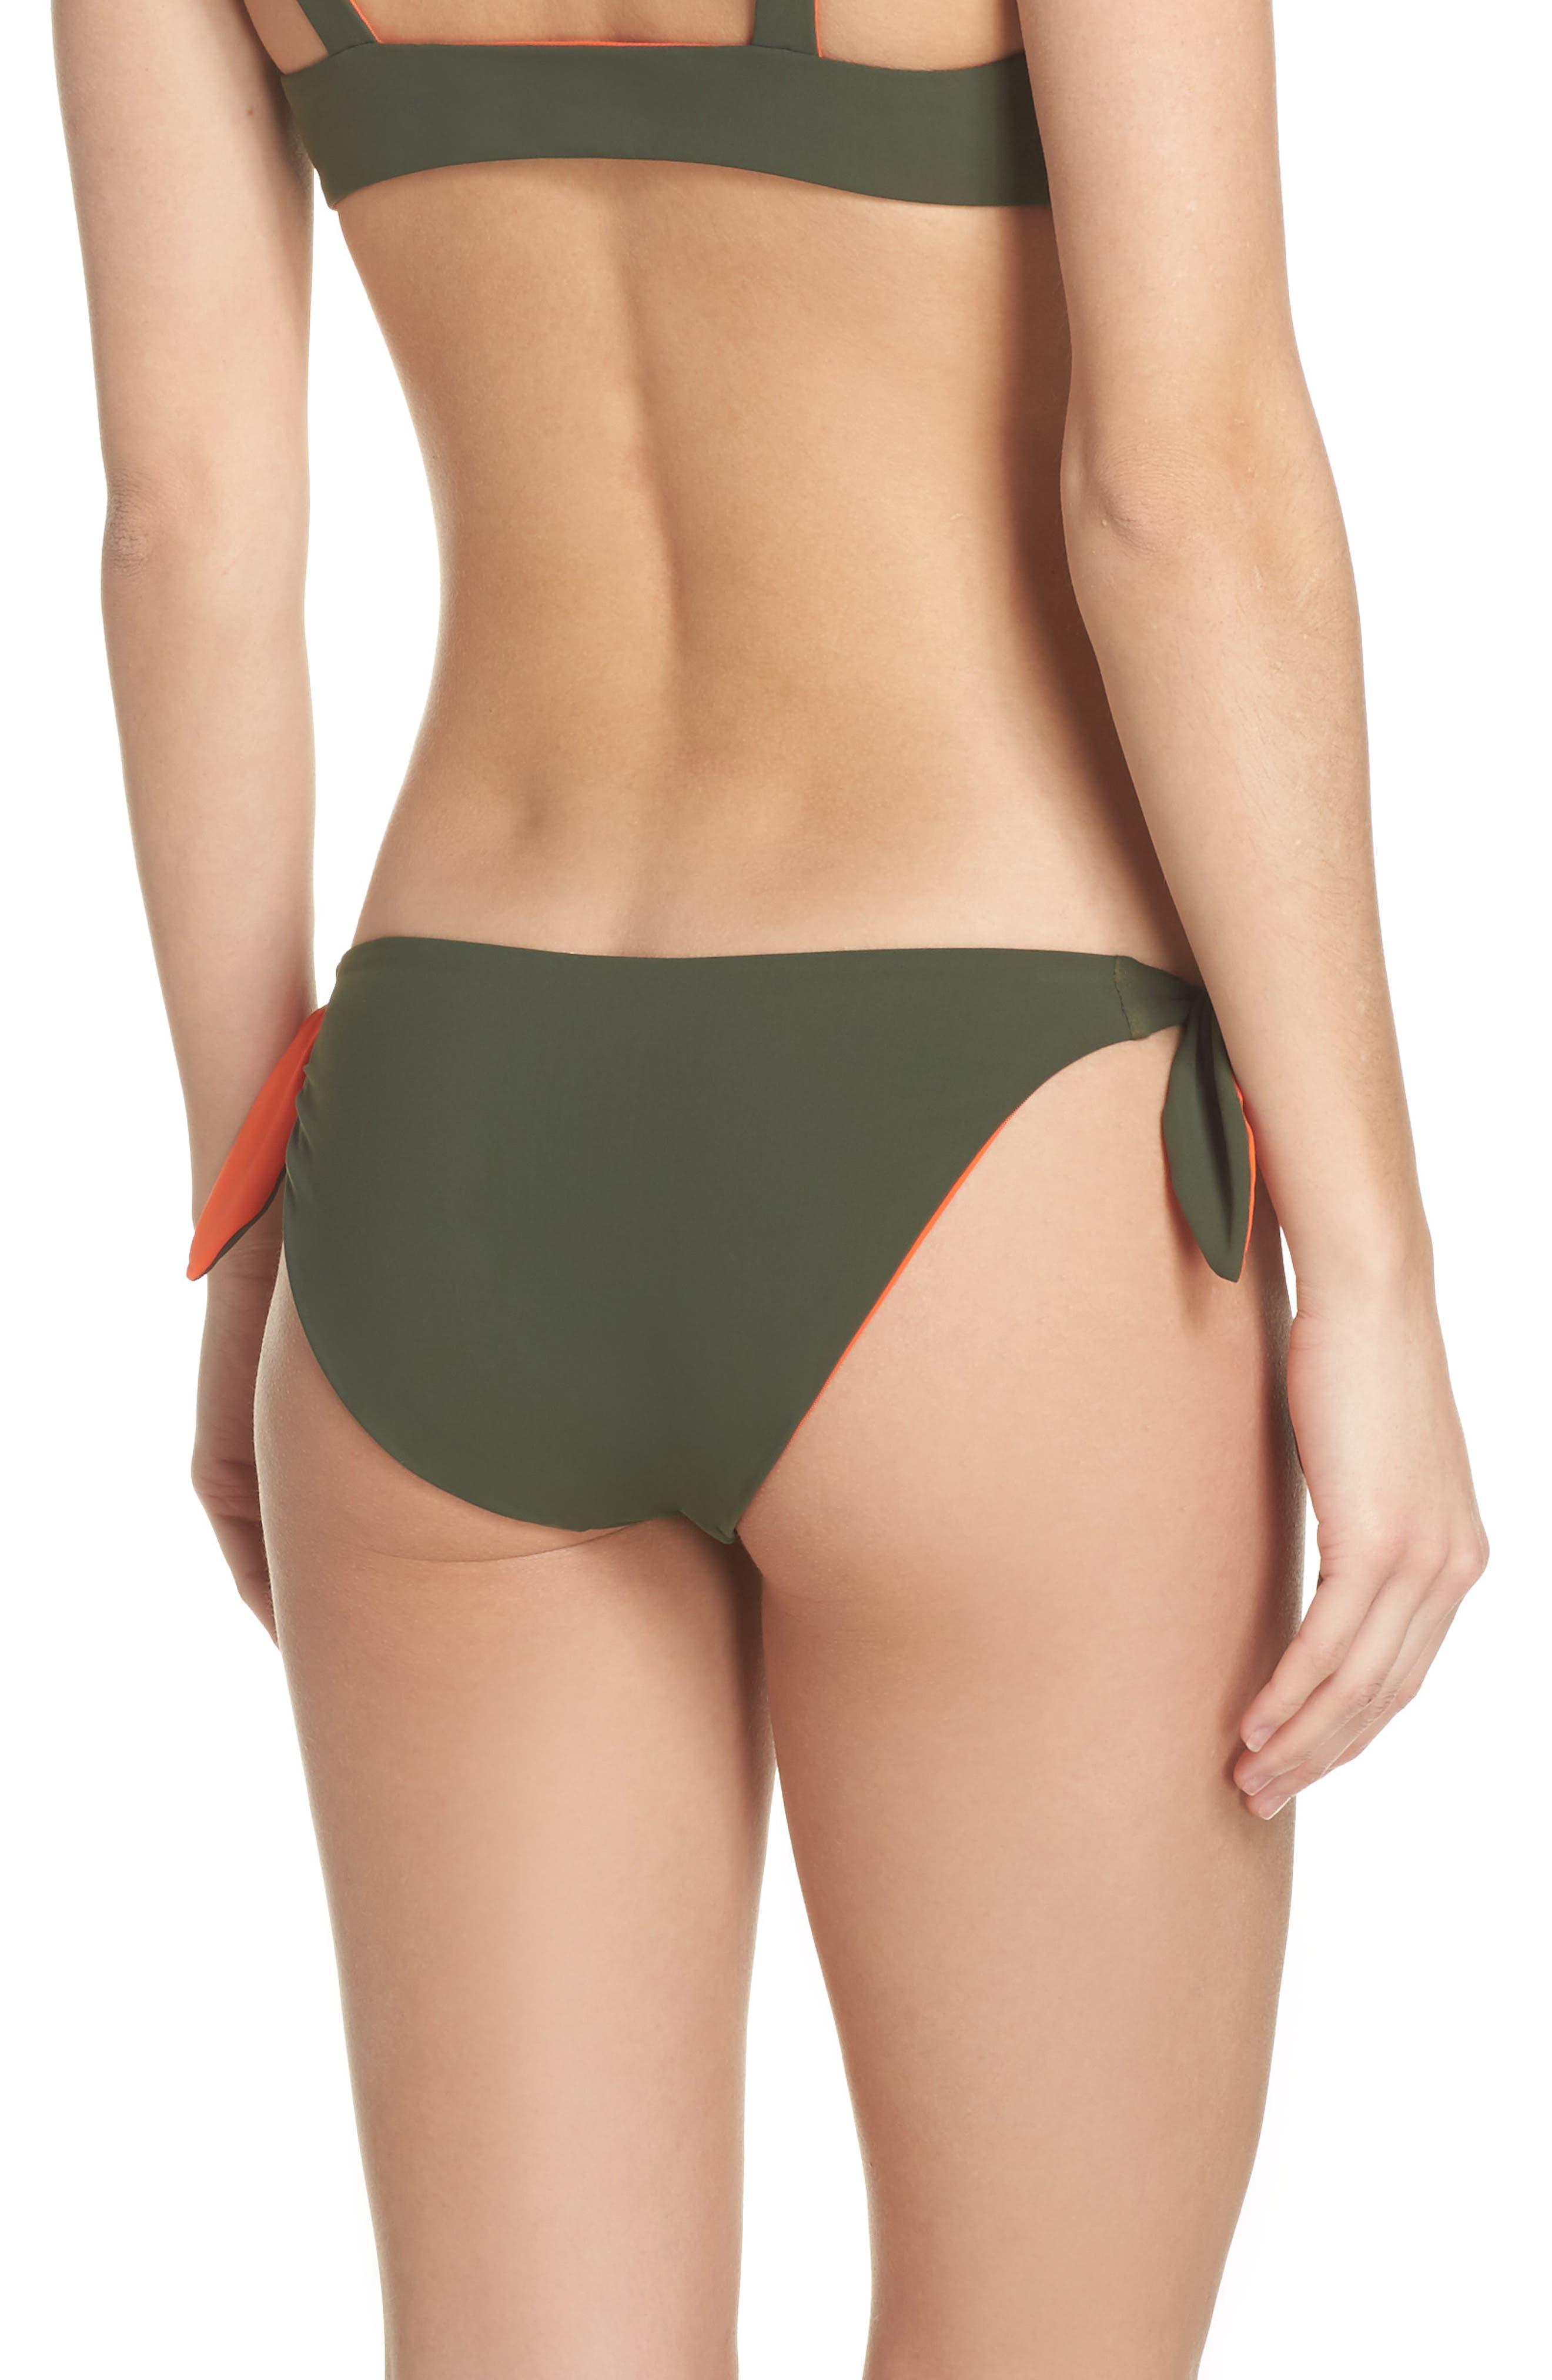 Biarritz Reversible Bikini Bottoms,                             Alternate thumbnail 3, color,                             Green Olive/ Sweet Tangerine